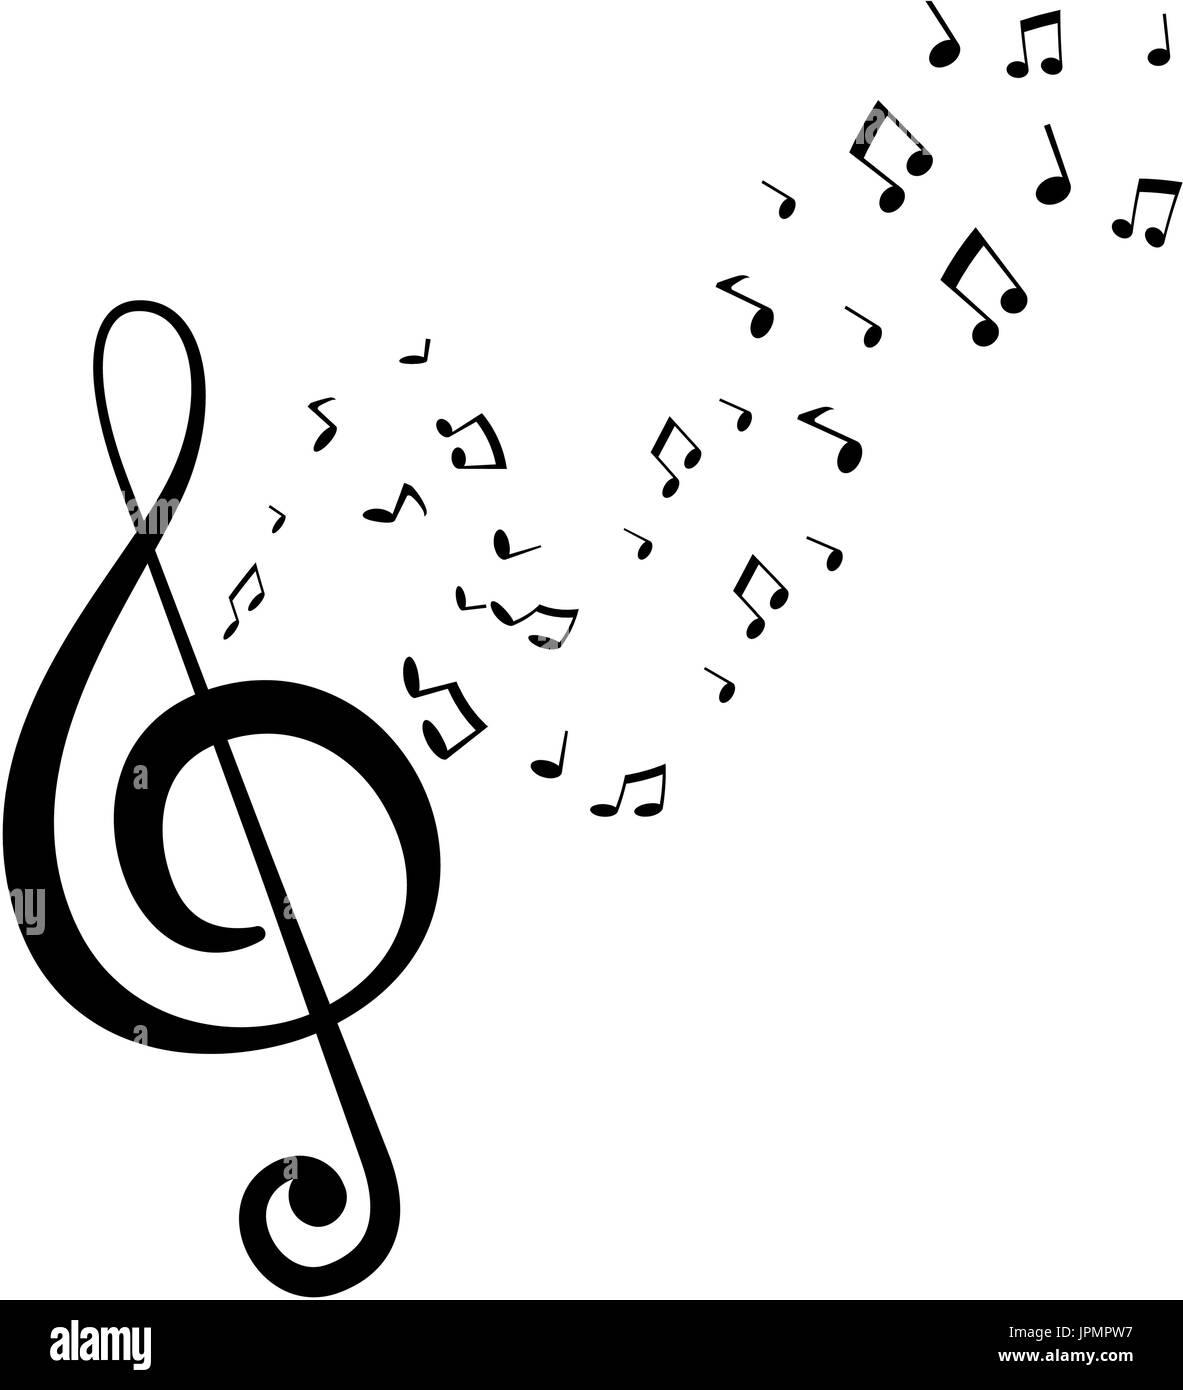 Music note symbol icon vector illustration graphic design stock music note symbol icon vector illustration graphic design buycottarizona